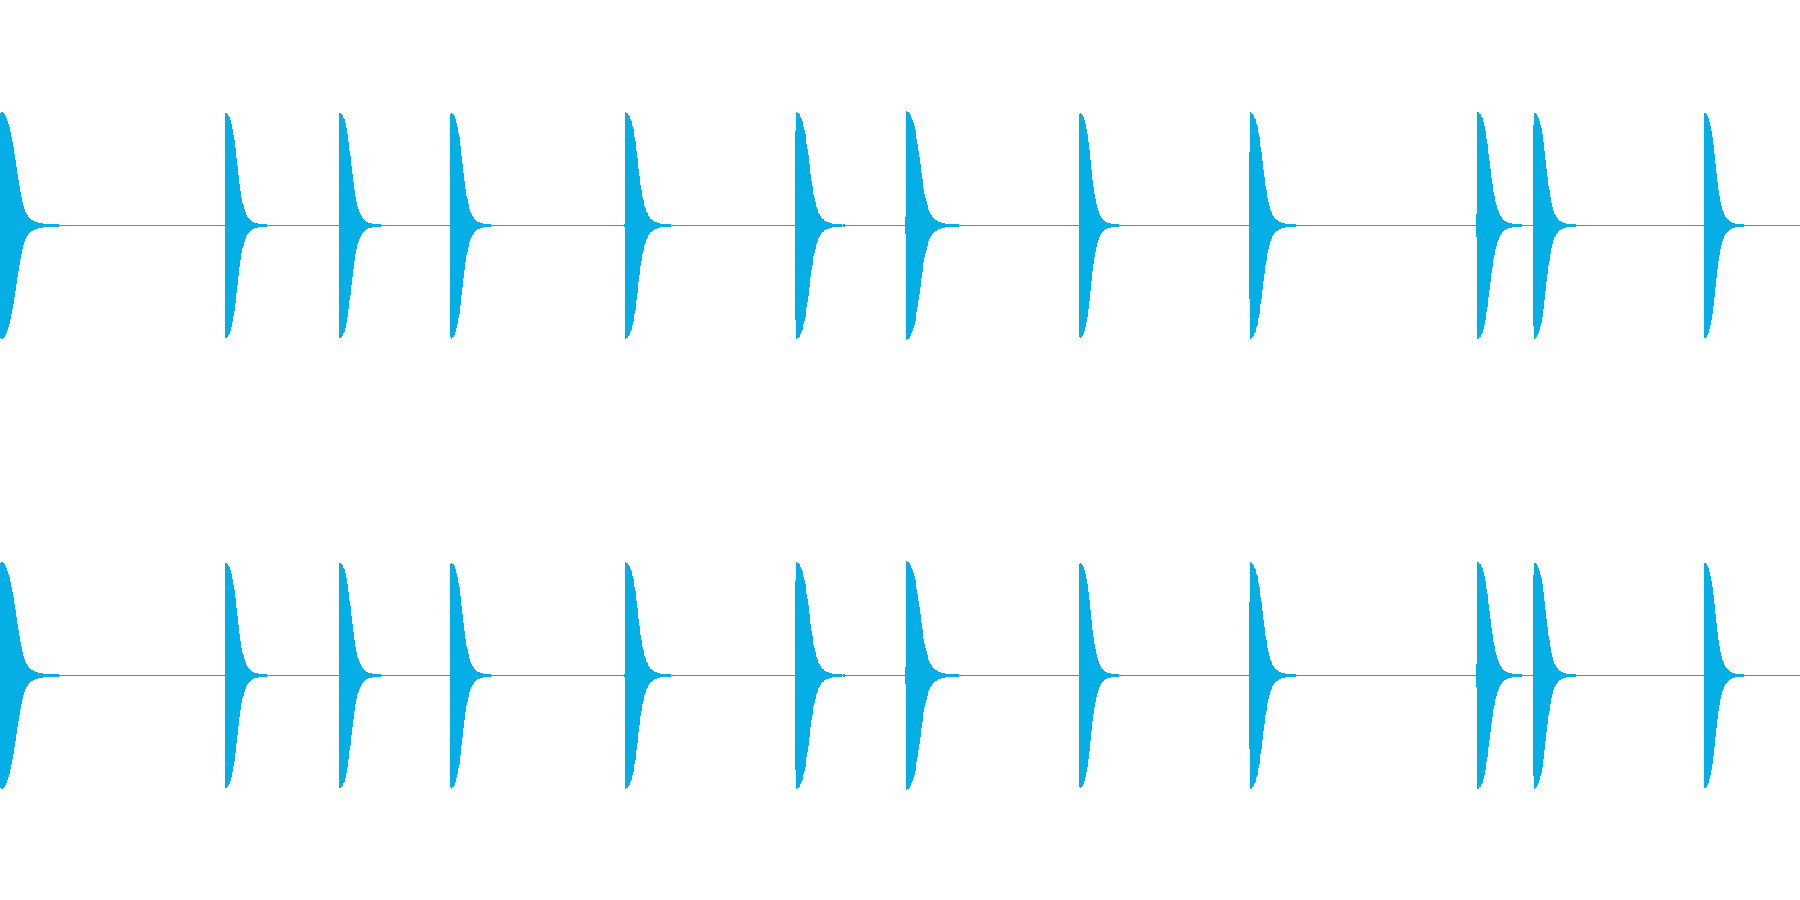 EDM PluckLoop4 Dry音の再生済みの波形